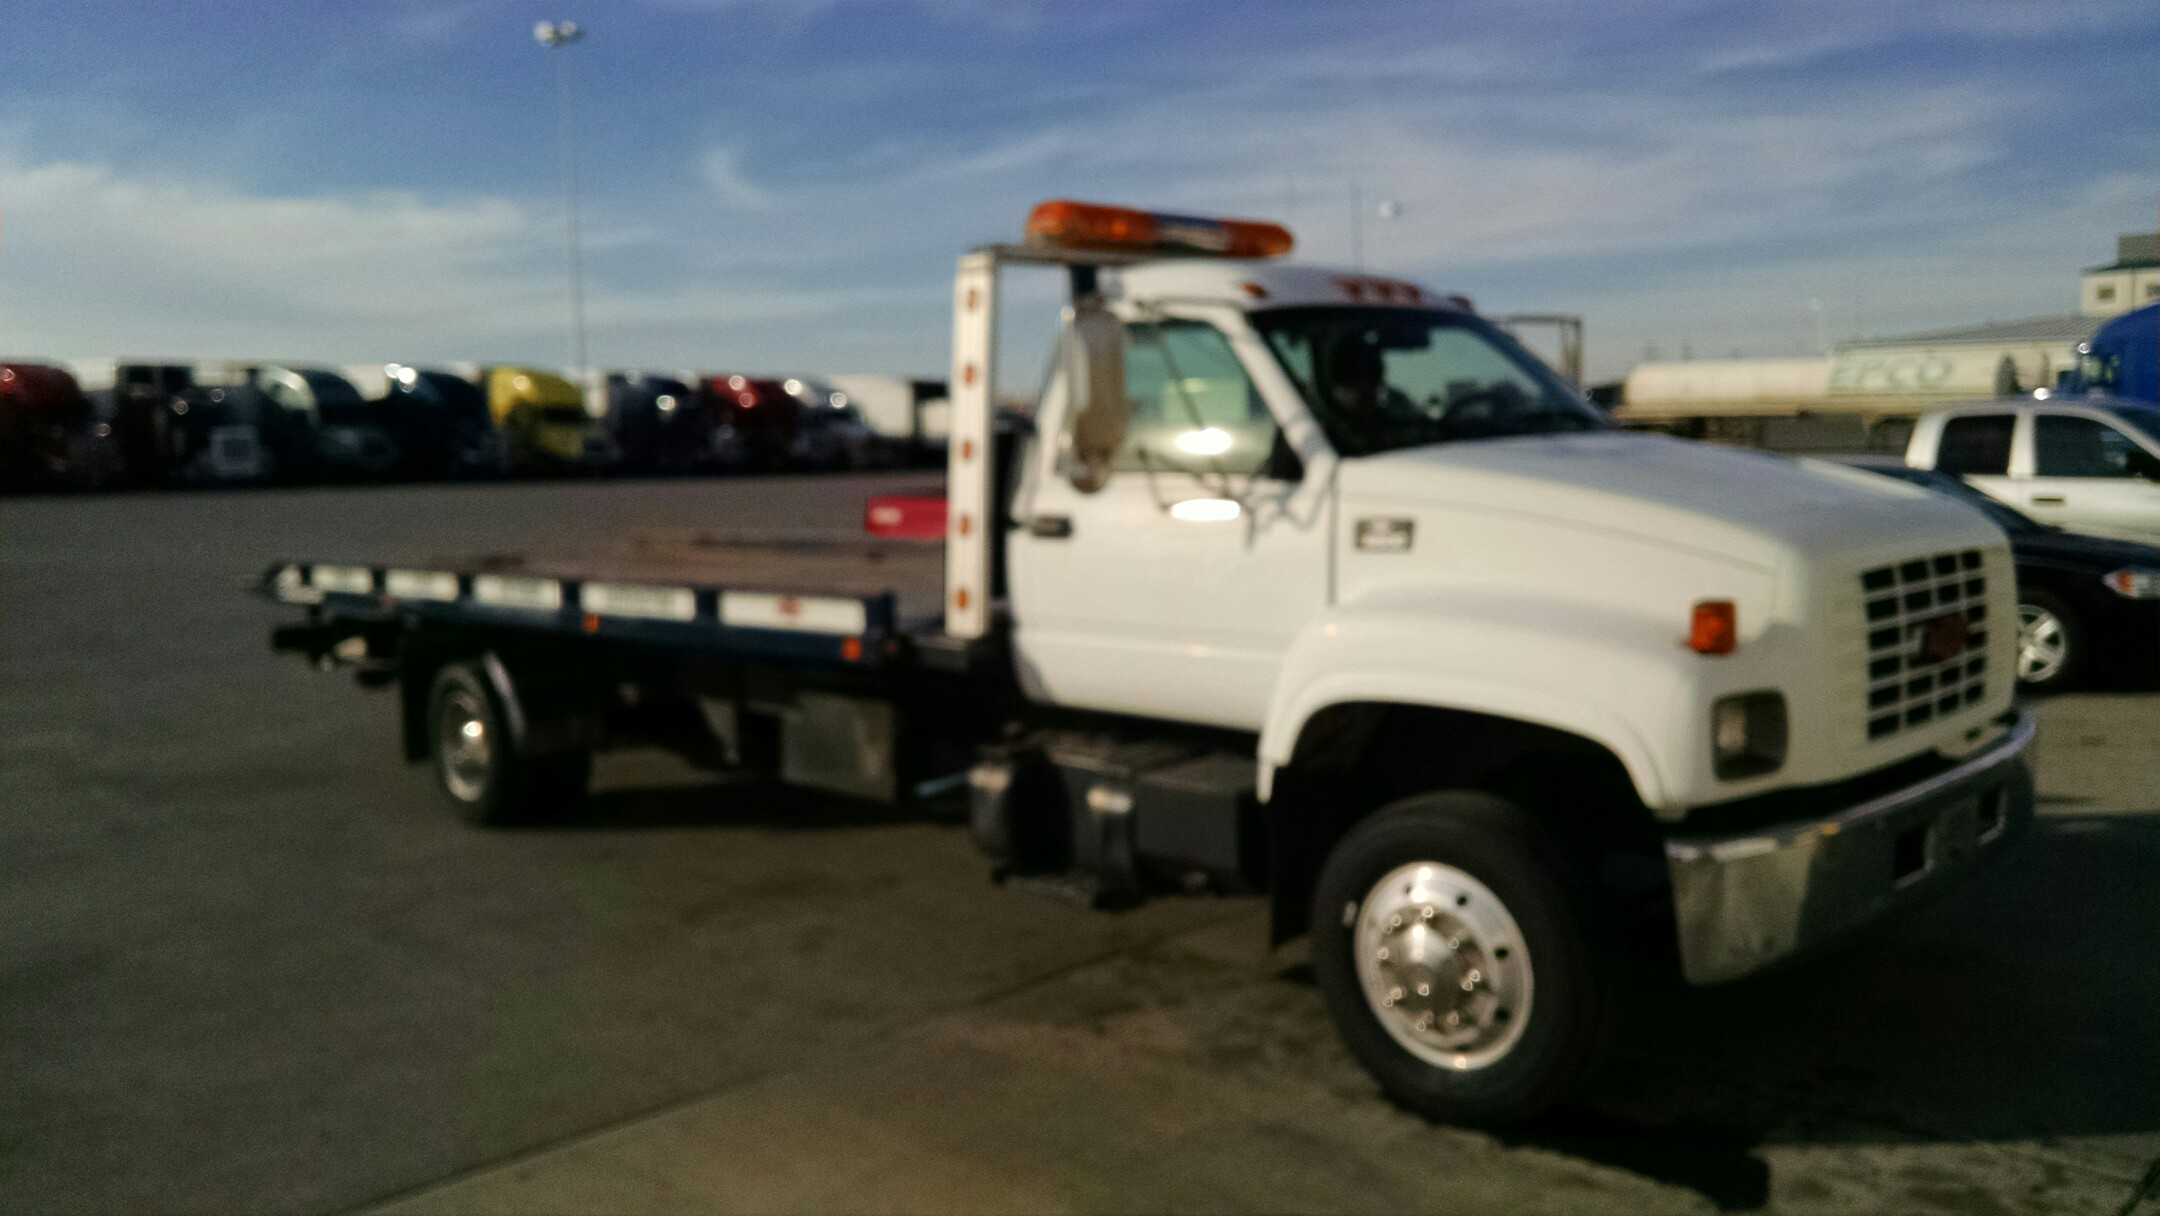 Harwood Roadside Service and Towing LLC